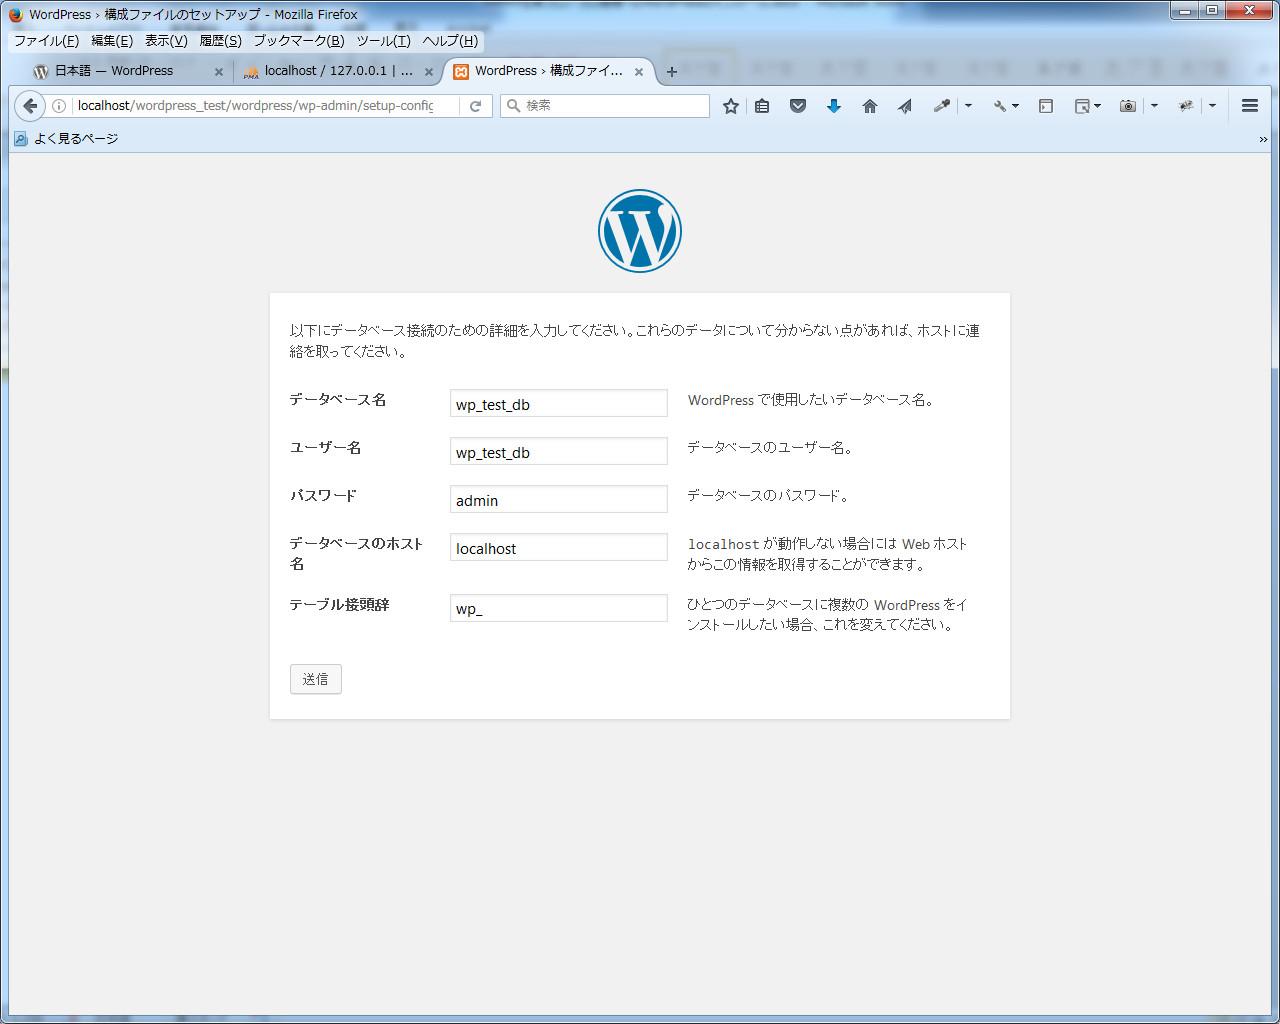 WordPressで使用するユーザーを設定